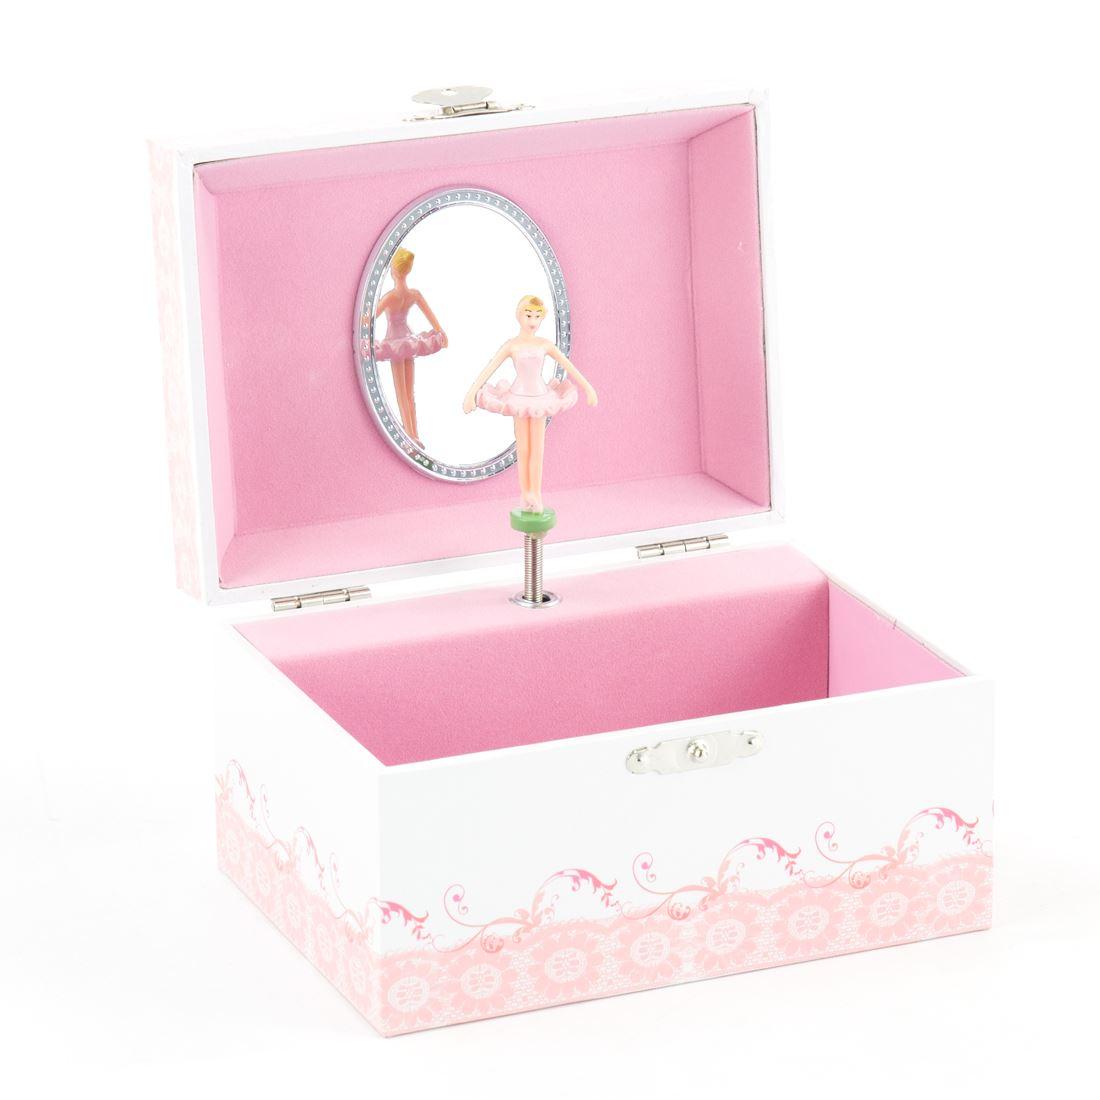 Mele Co Kids Pink Spinning Ballerina Figure Musical Girls